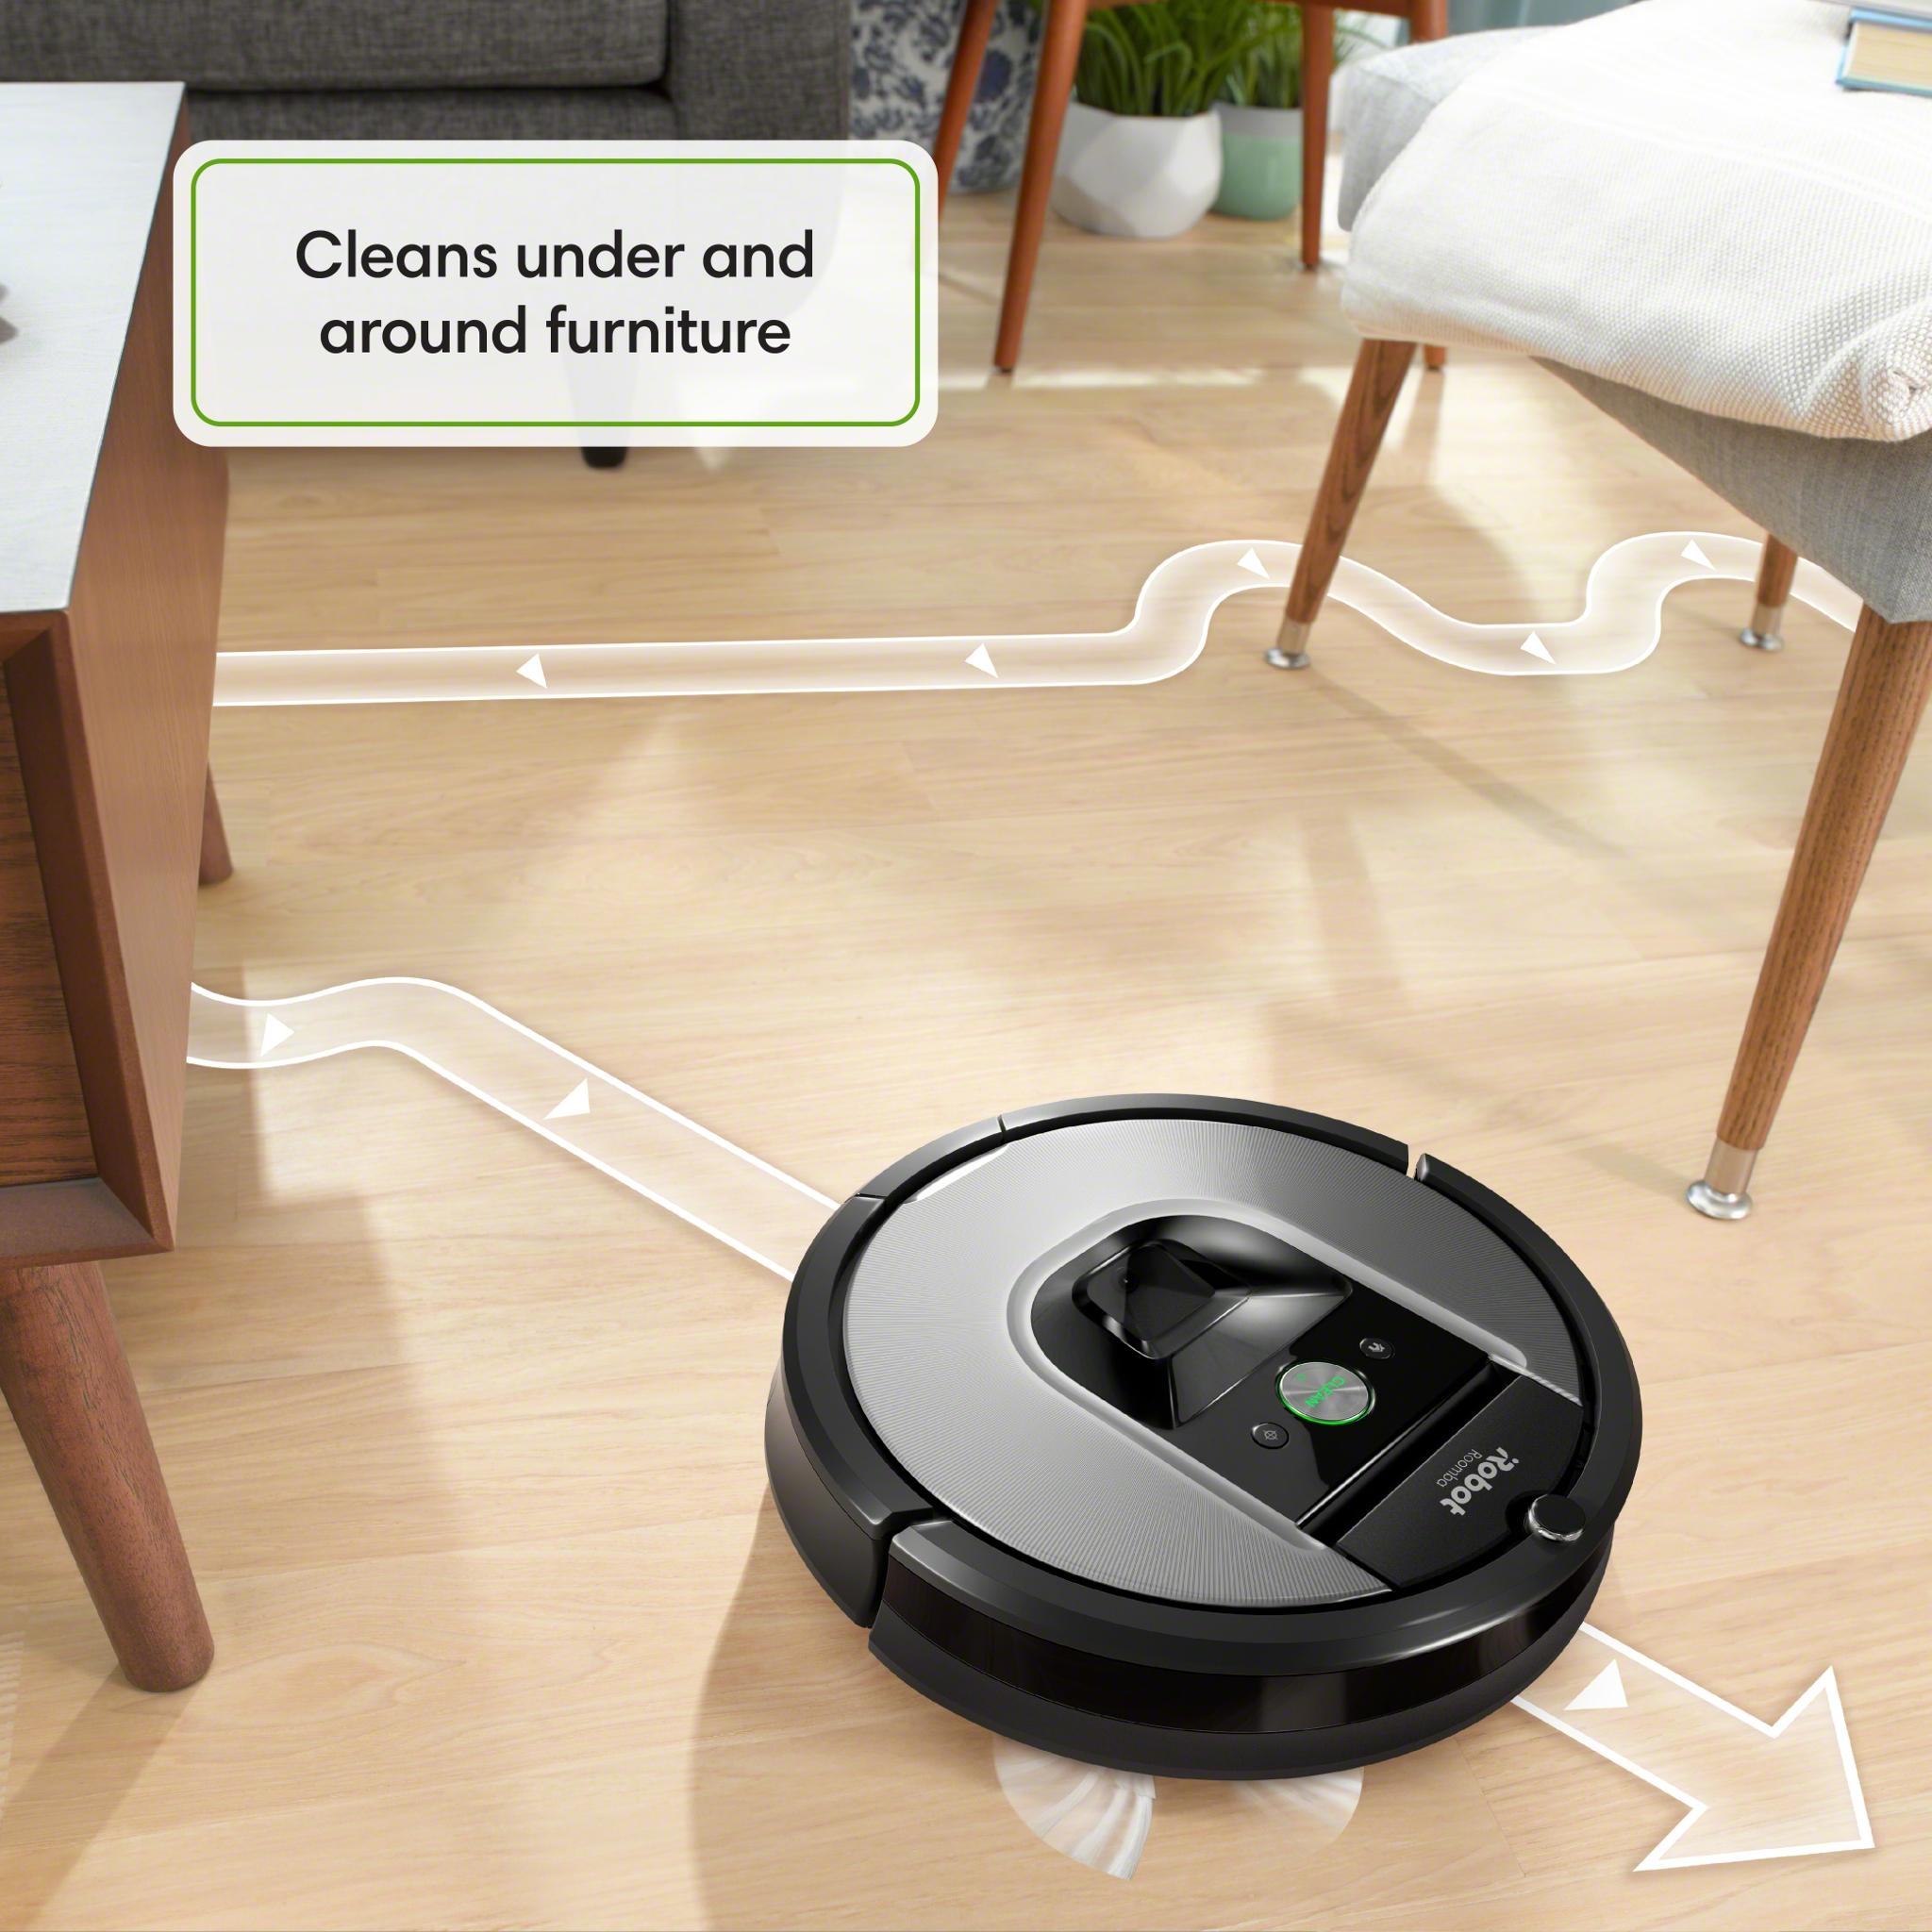 iRobot Roomba 960 $399.99 + Free shipping Amazon